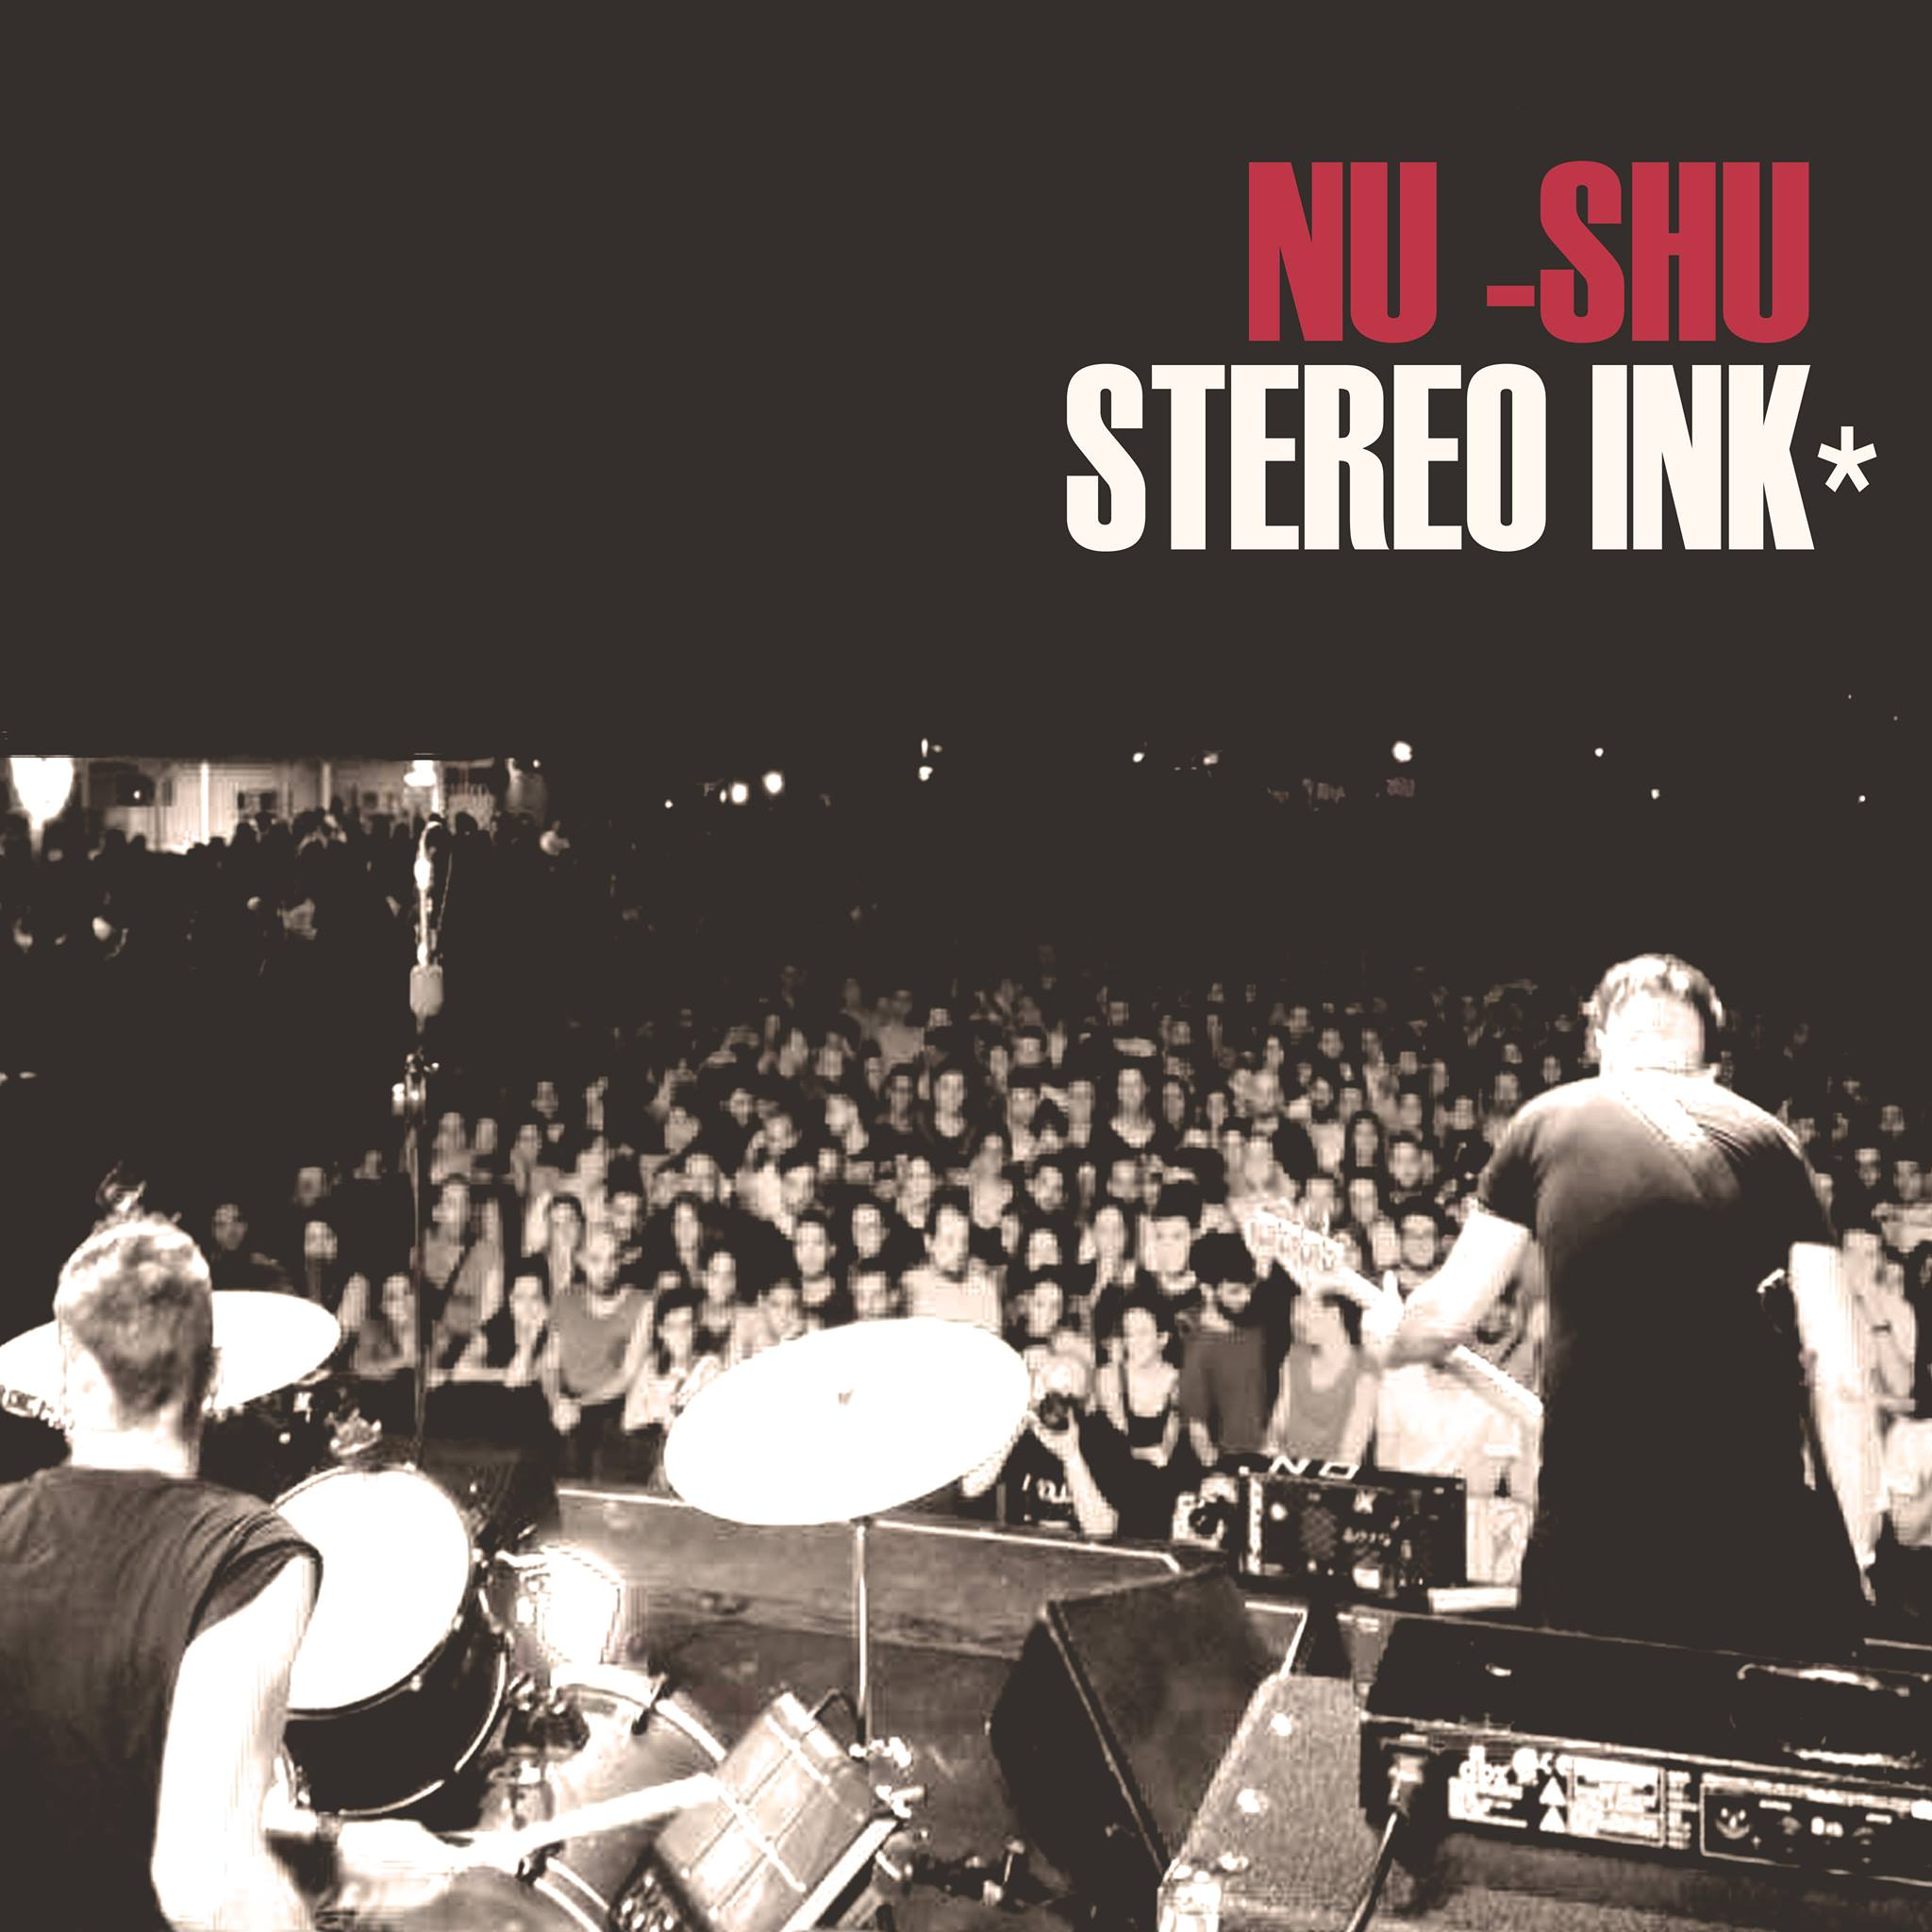 nu-shu-stereo-ink